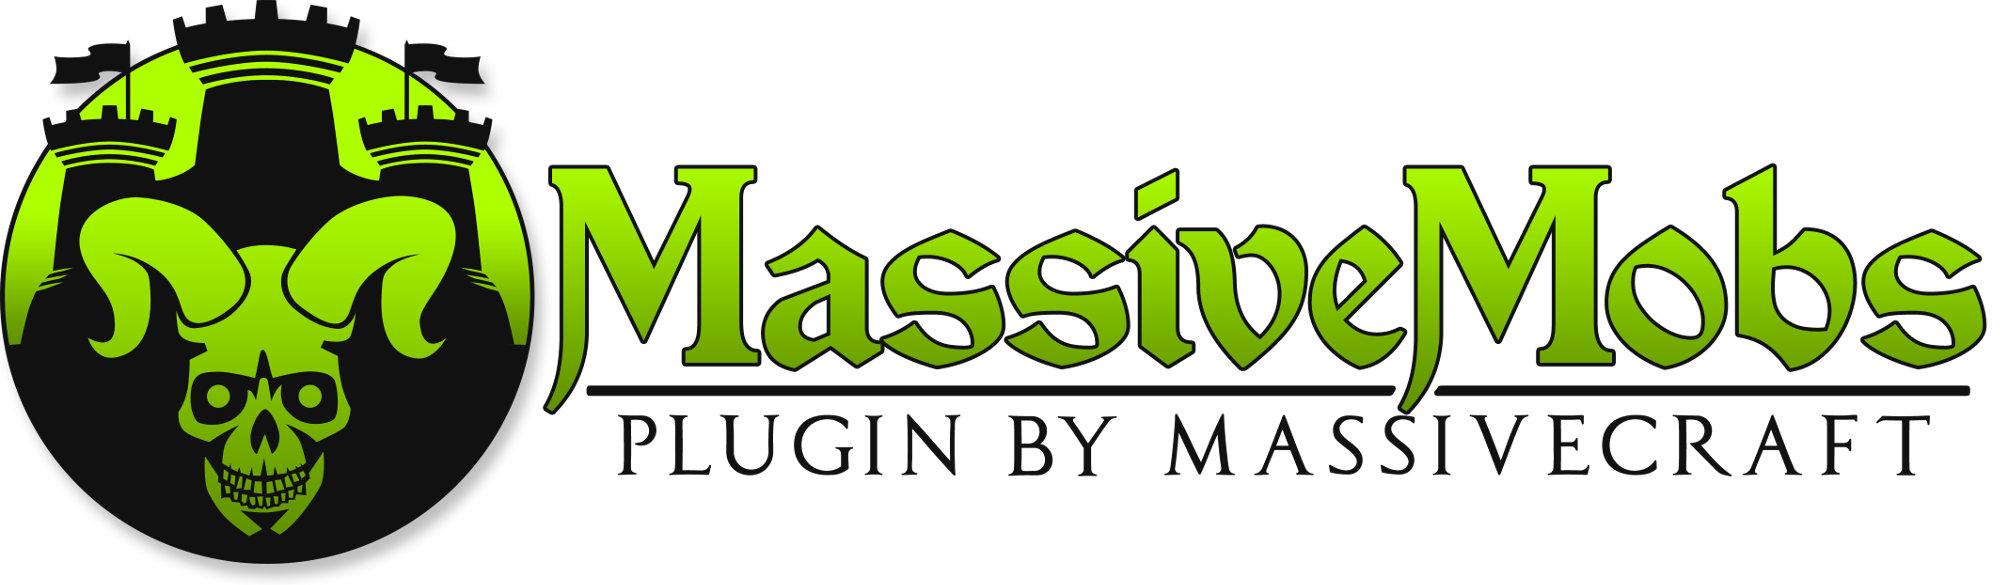 massivecraft-logotype-plugin-massivemobs-2000